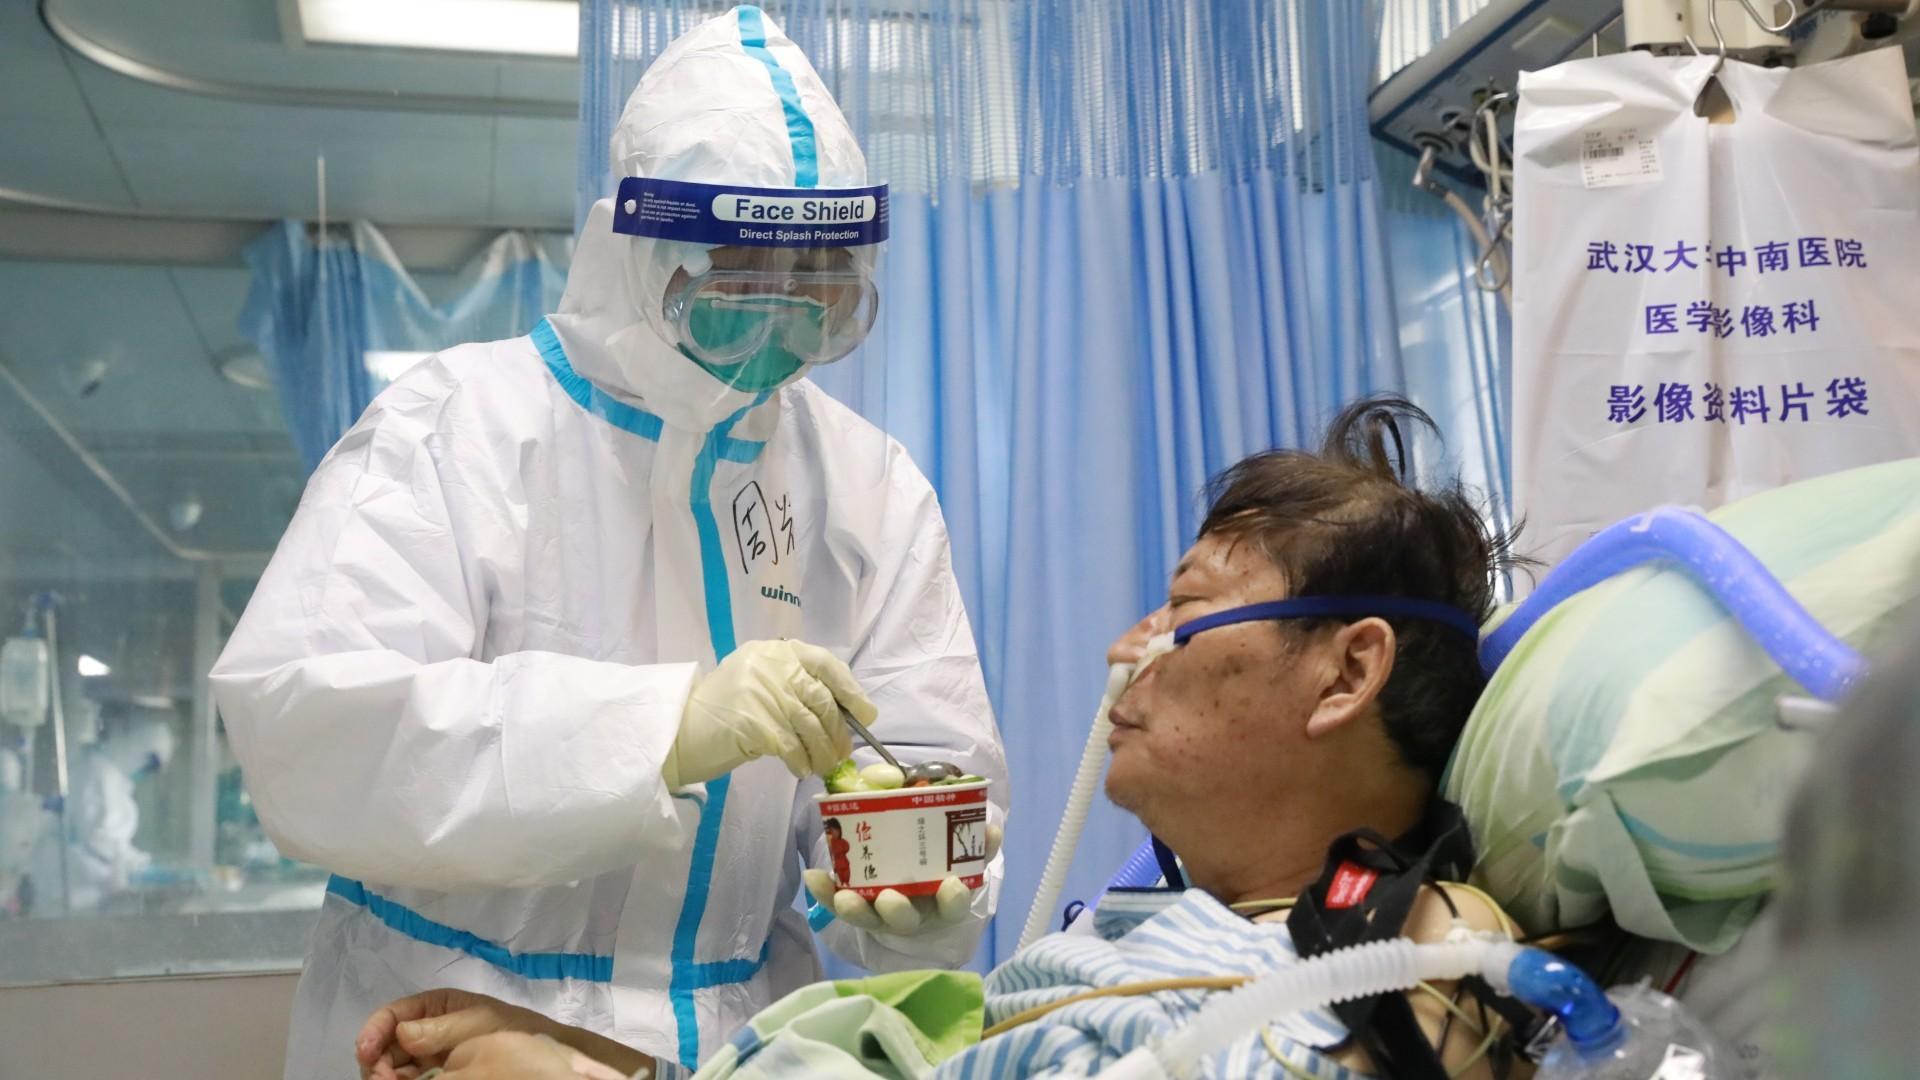 Coronavirus fatalities: World Health Organization figures disputed